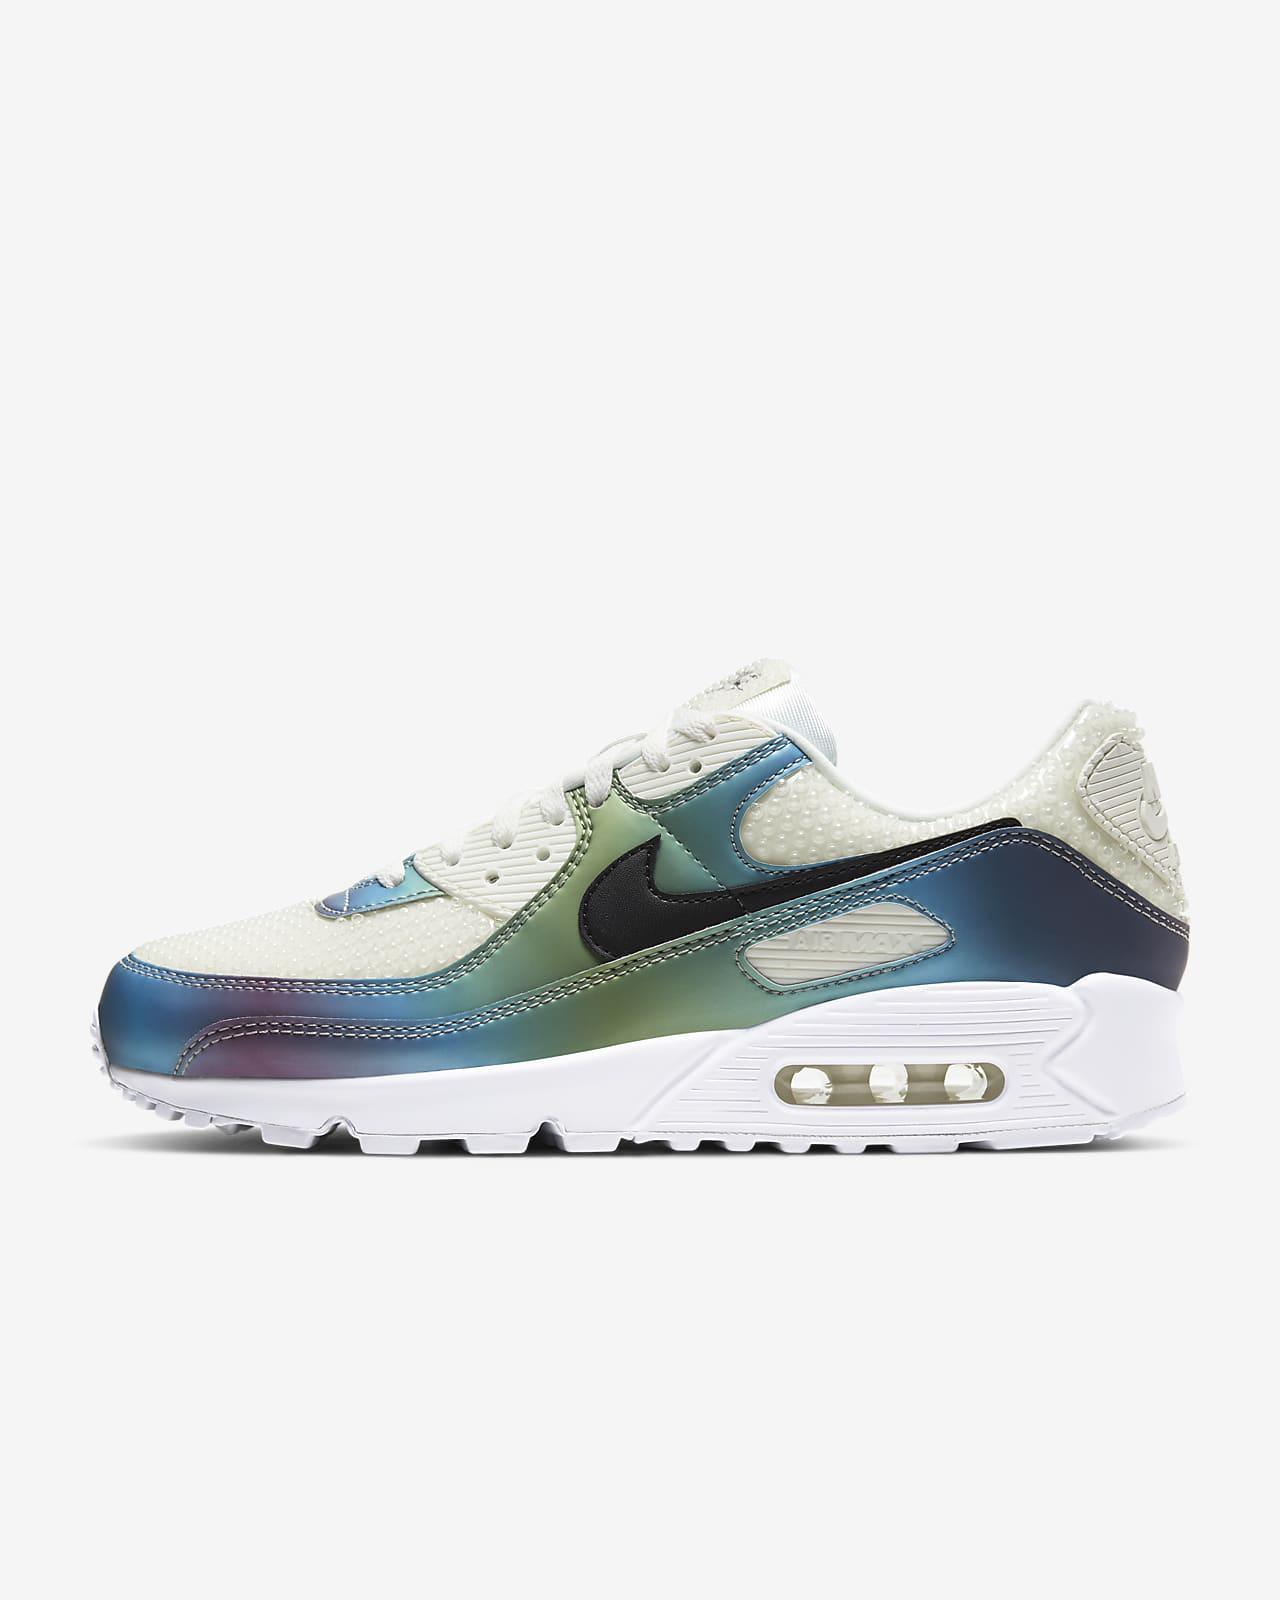 Nike Air Max 90 20 男子运动鞋